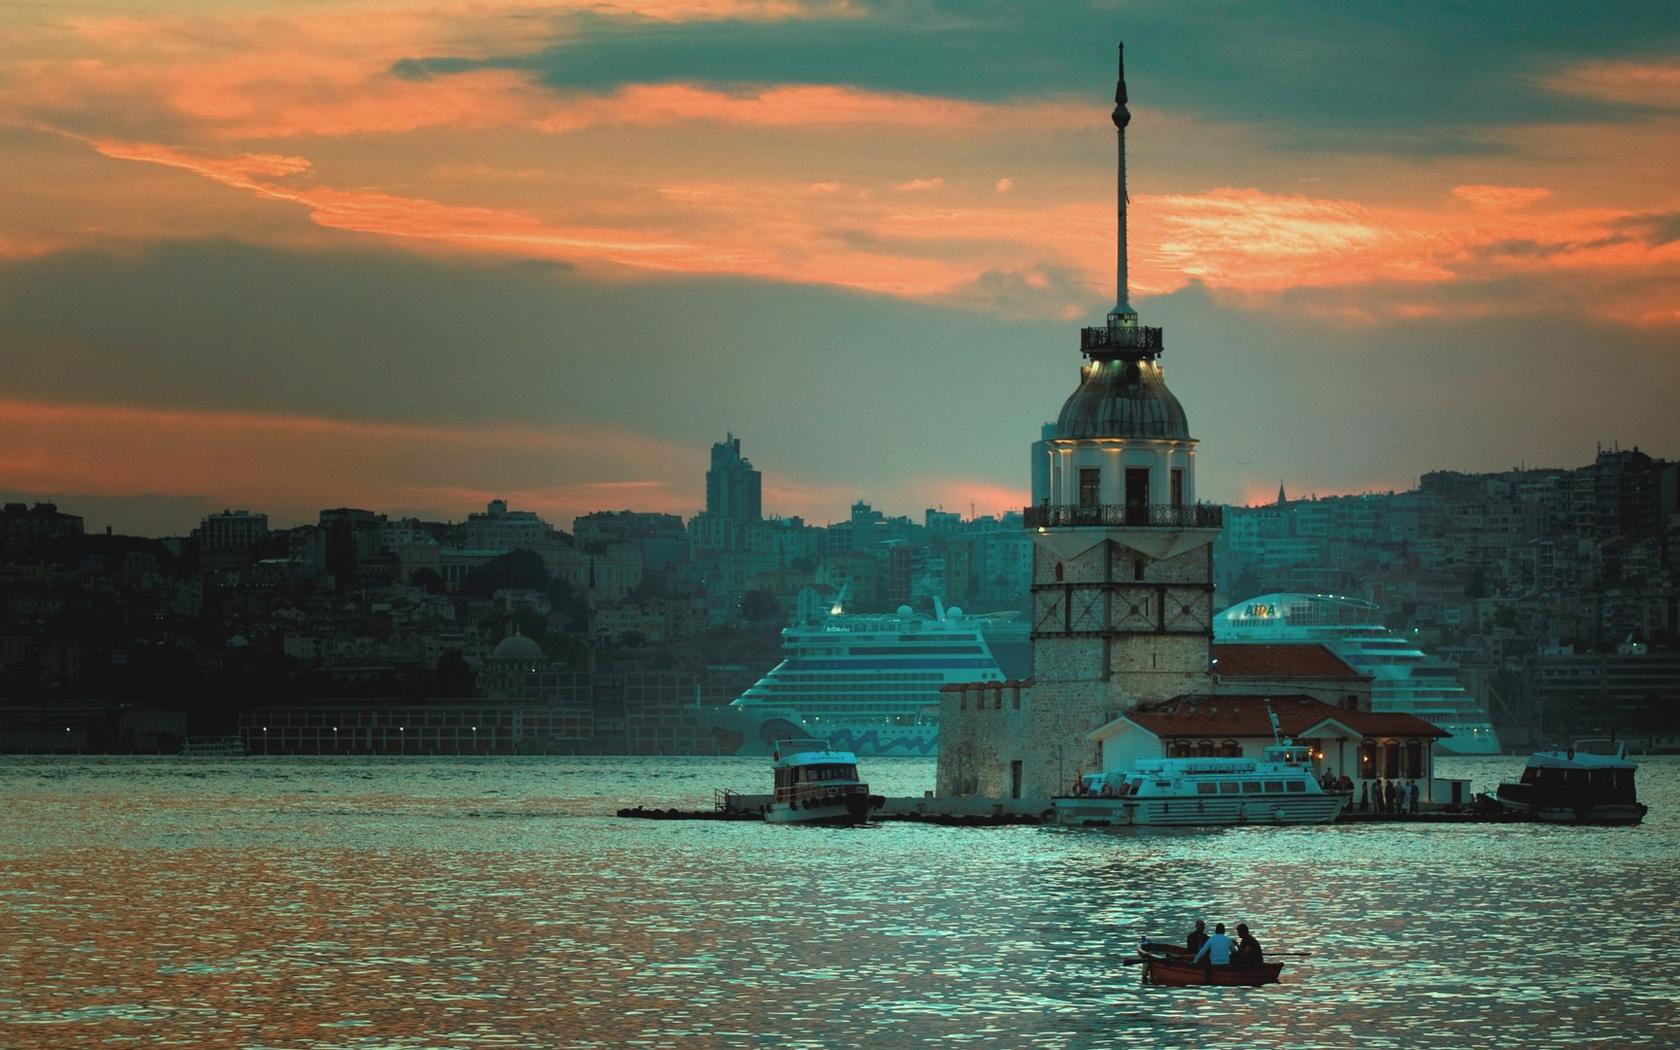 Istanbul Bosphorus Wallpapers - 1680x1050 - 1839819